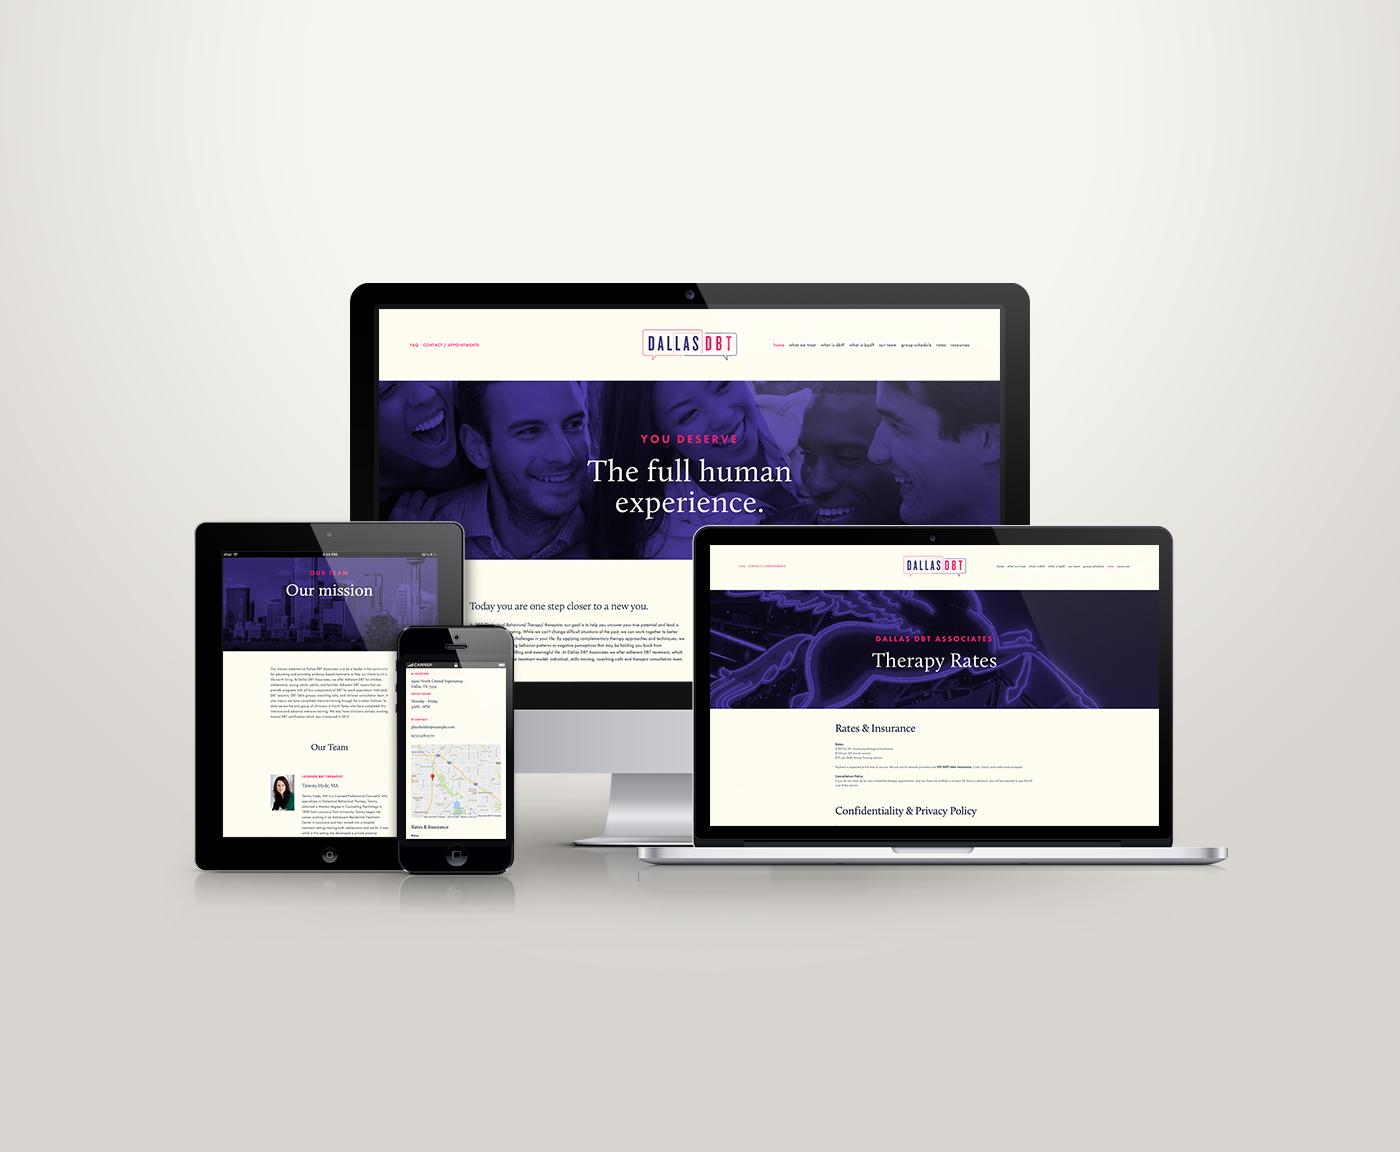 www.dallasdbt.com